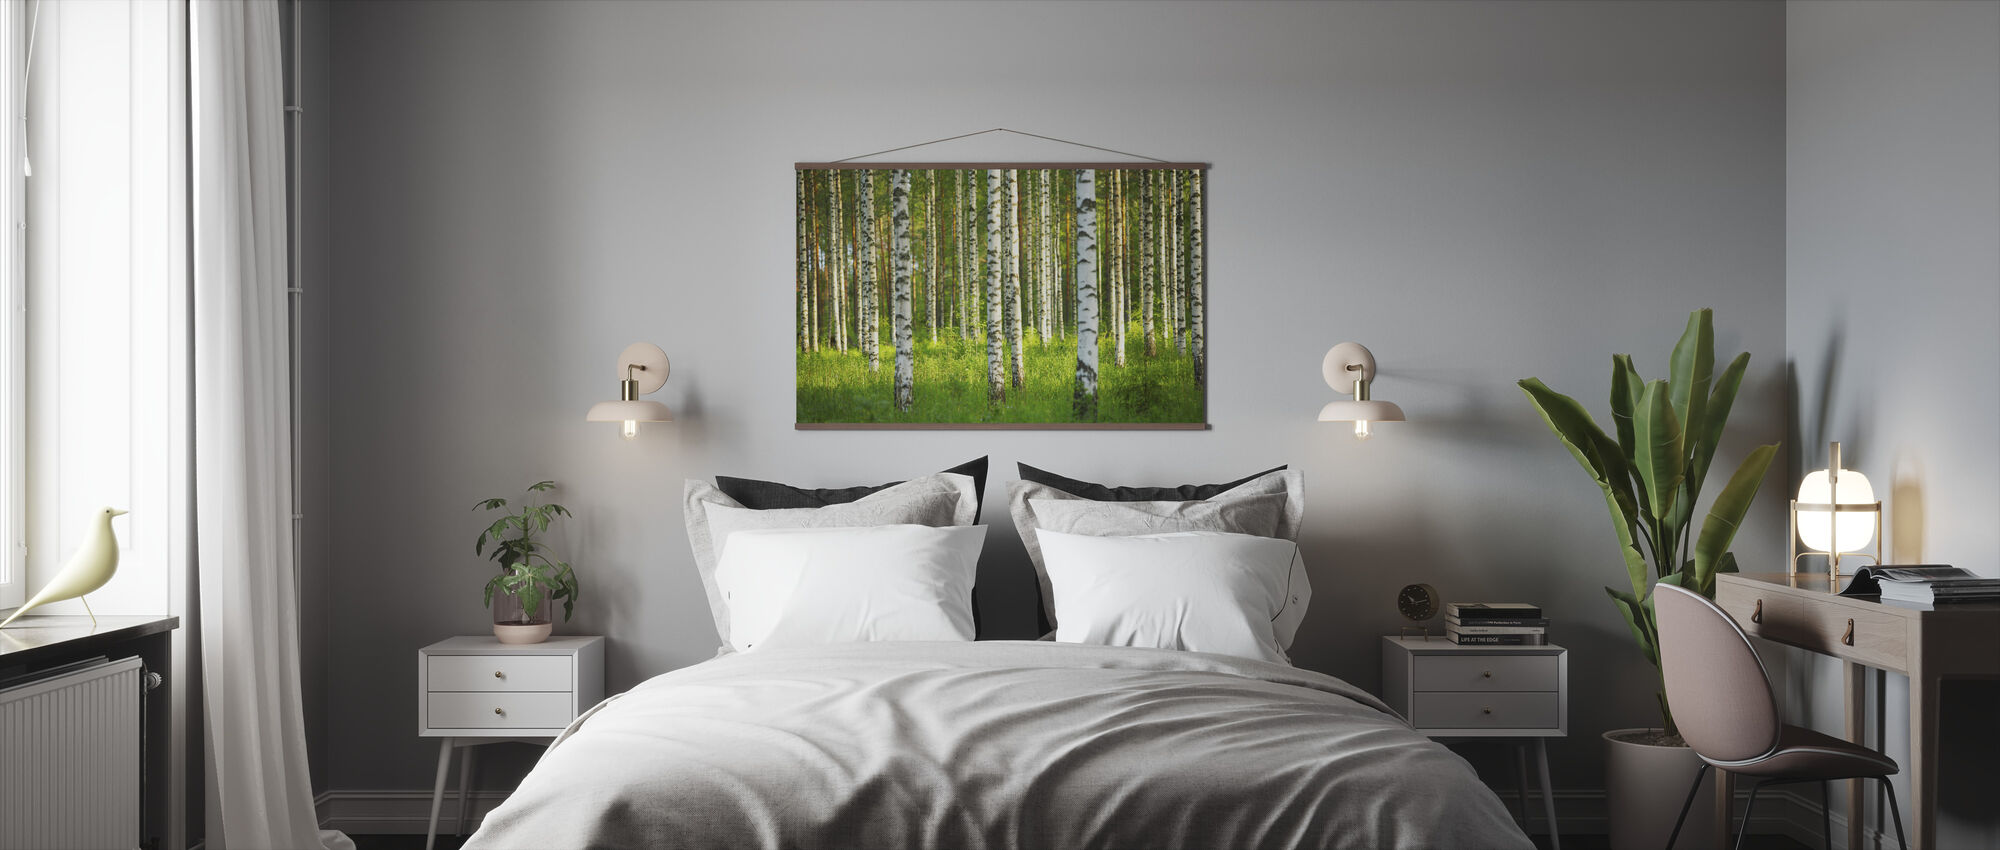 Birch Forest - Poster - Bedroom